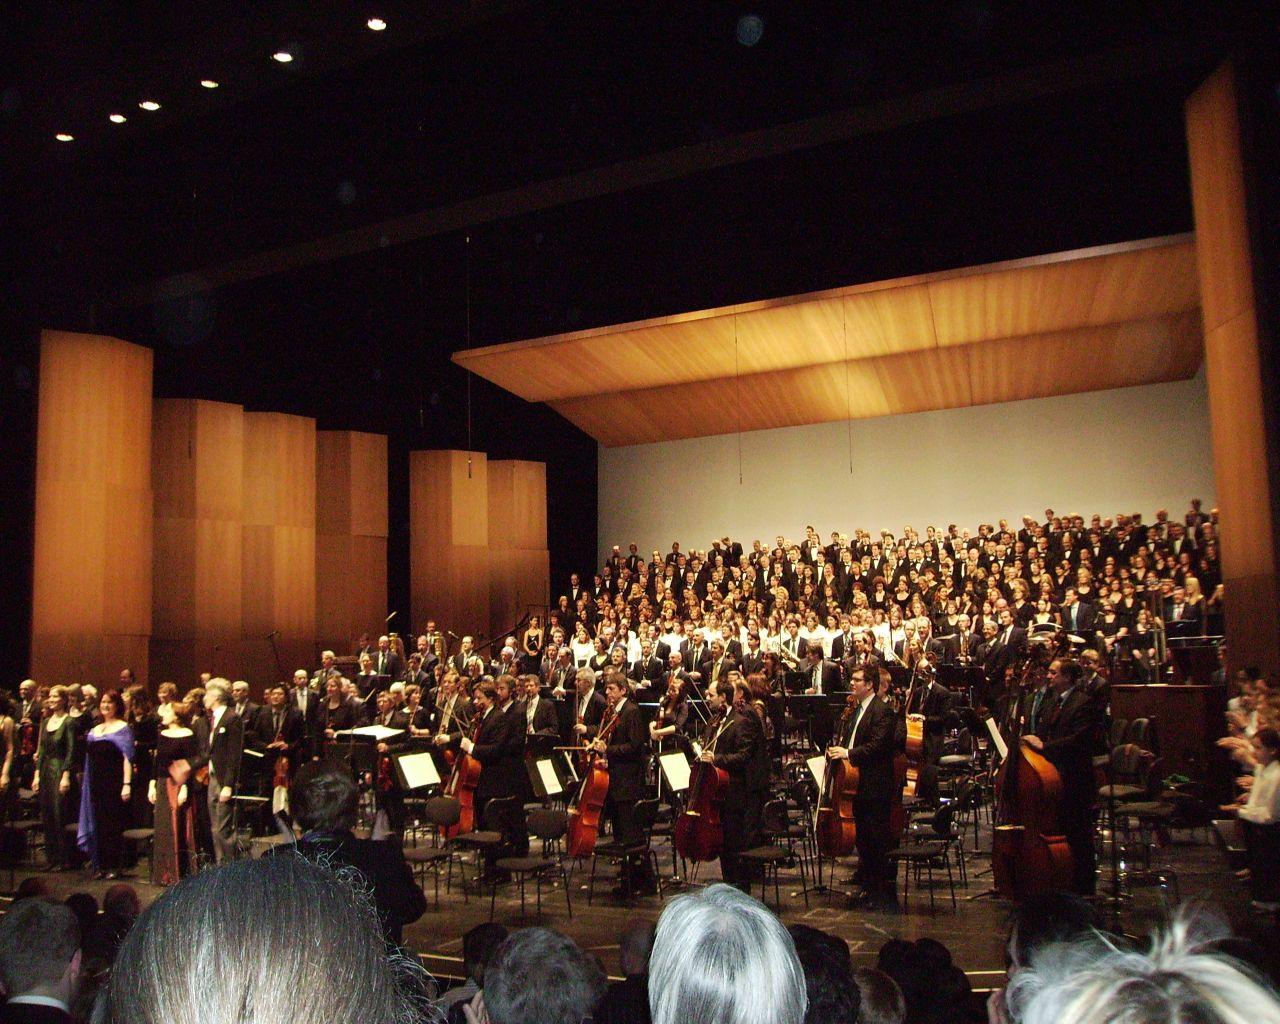 KonzertbildMahler2008